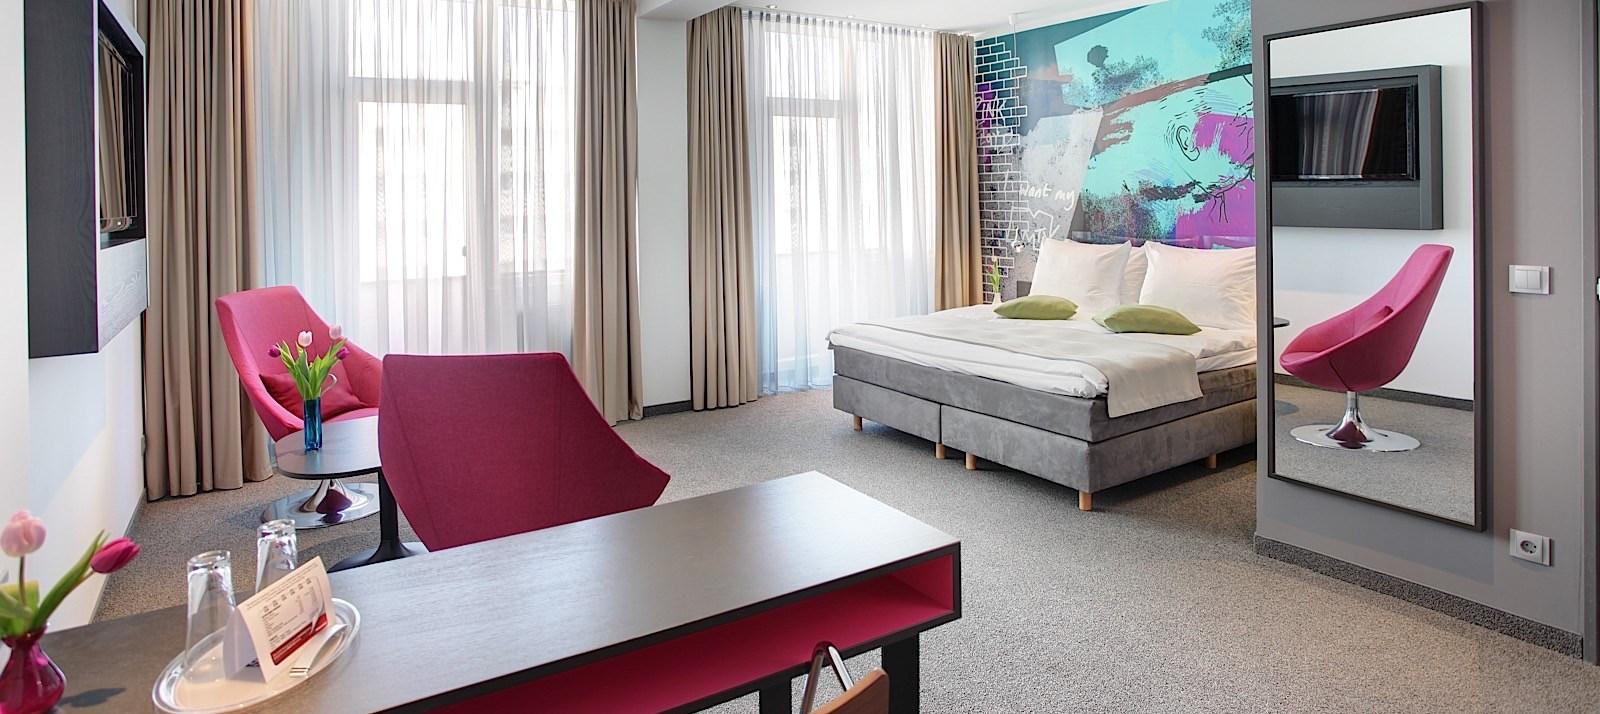 Photo of ۱۰ نکته برای انتخاب و رزرو هتل